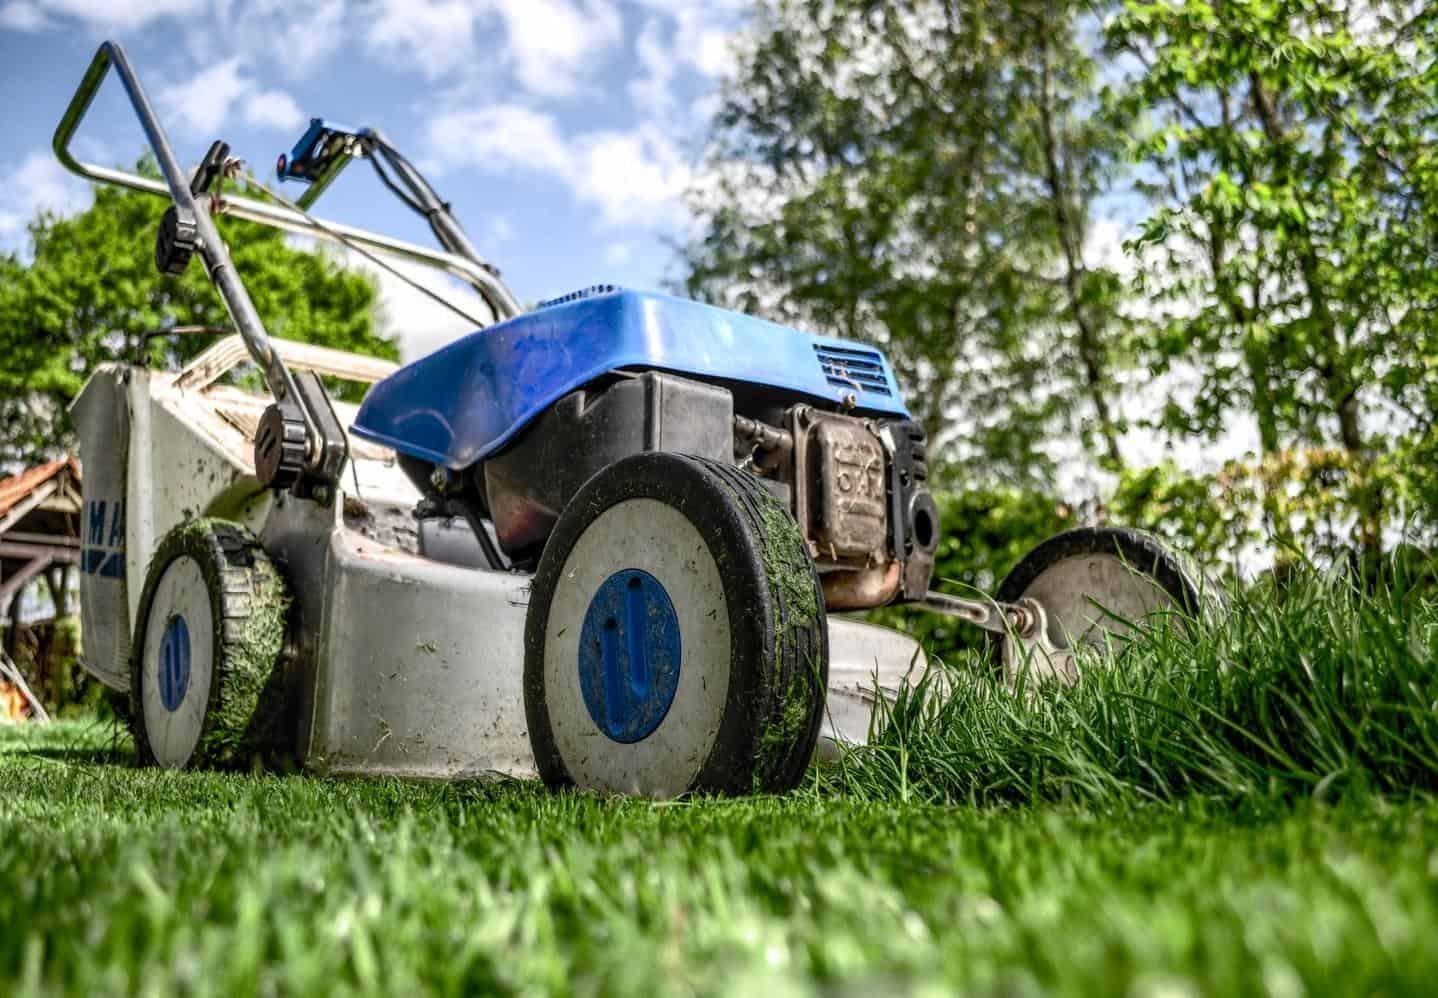 bolens lawn mower review